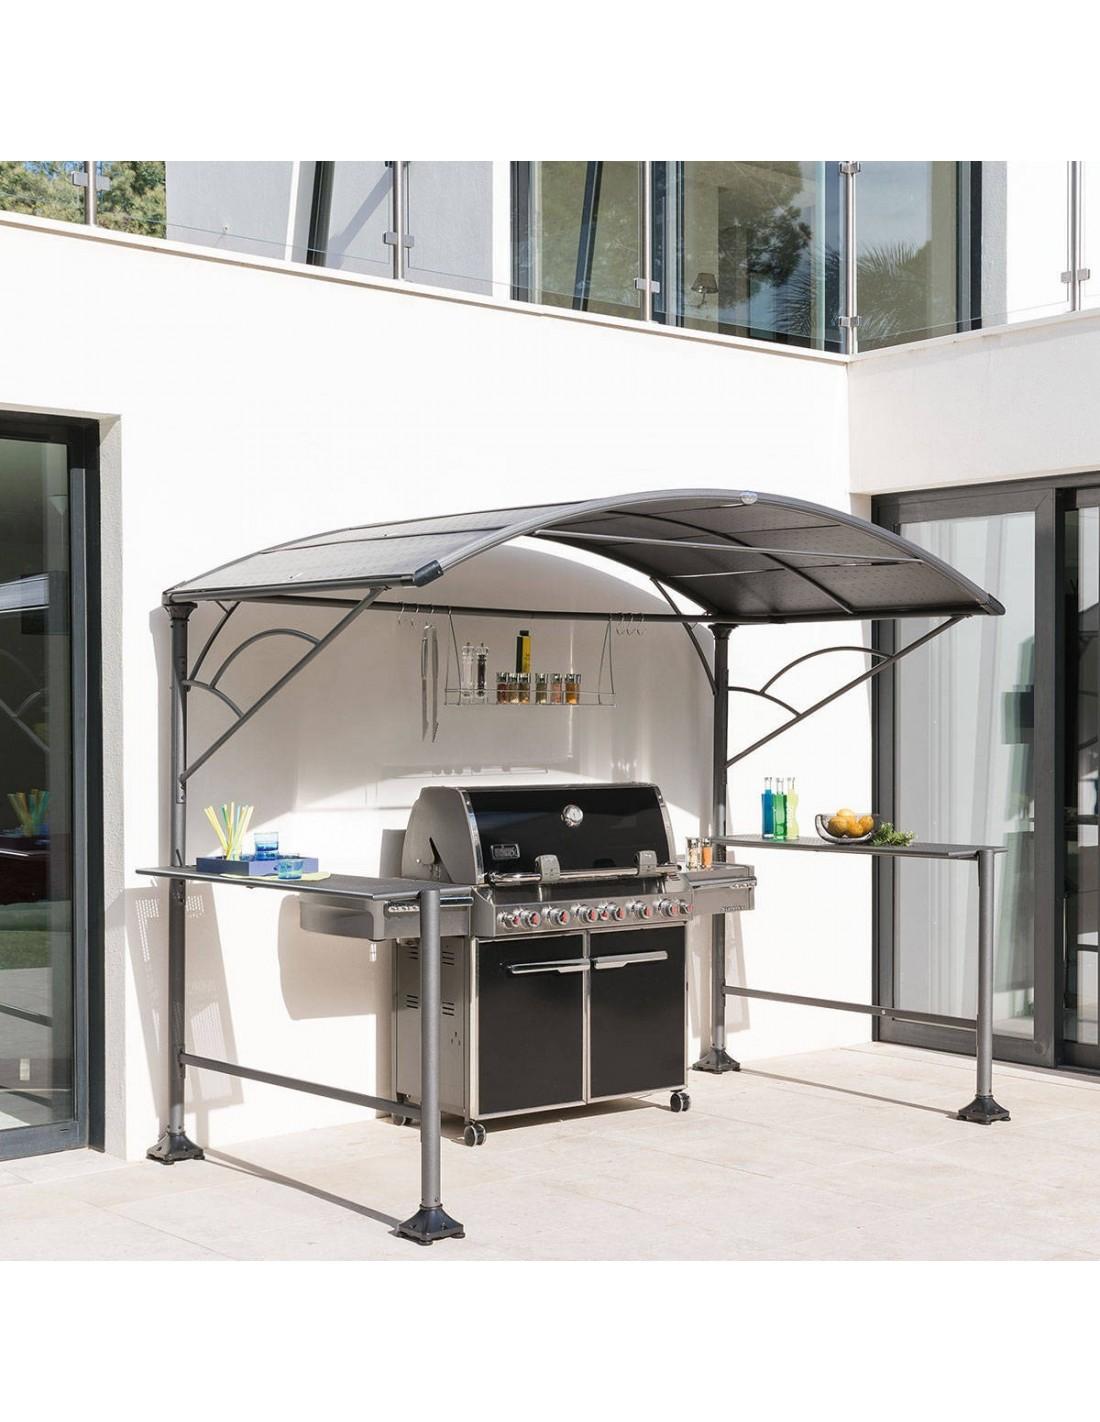 abri barbecue plancha neiba x1 5 m acier graphite hesp ride. Black Bedroom Furniture Sets. Home Design Ideas